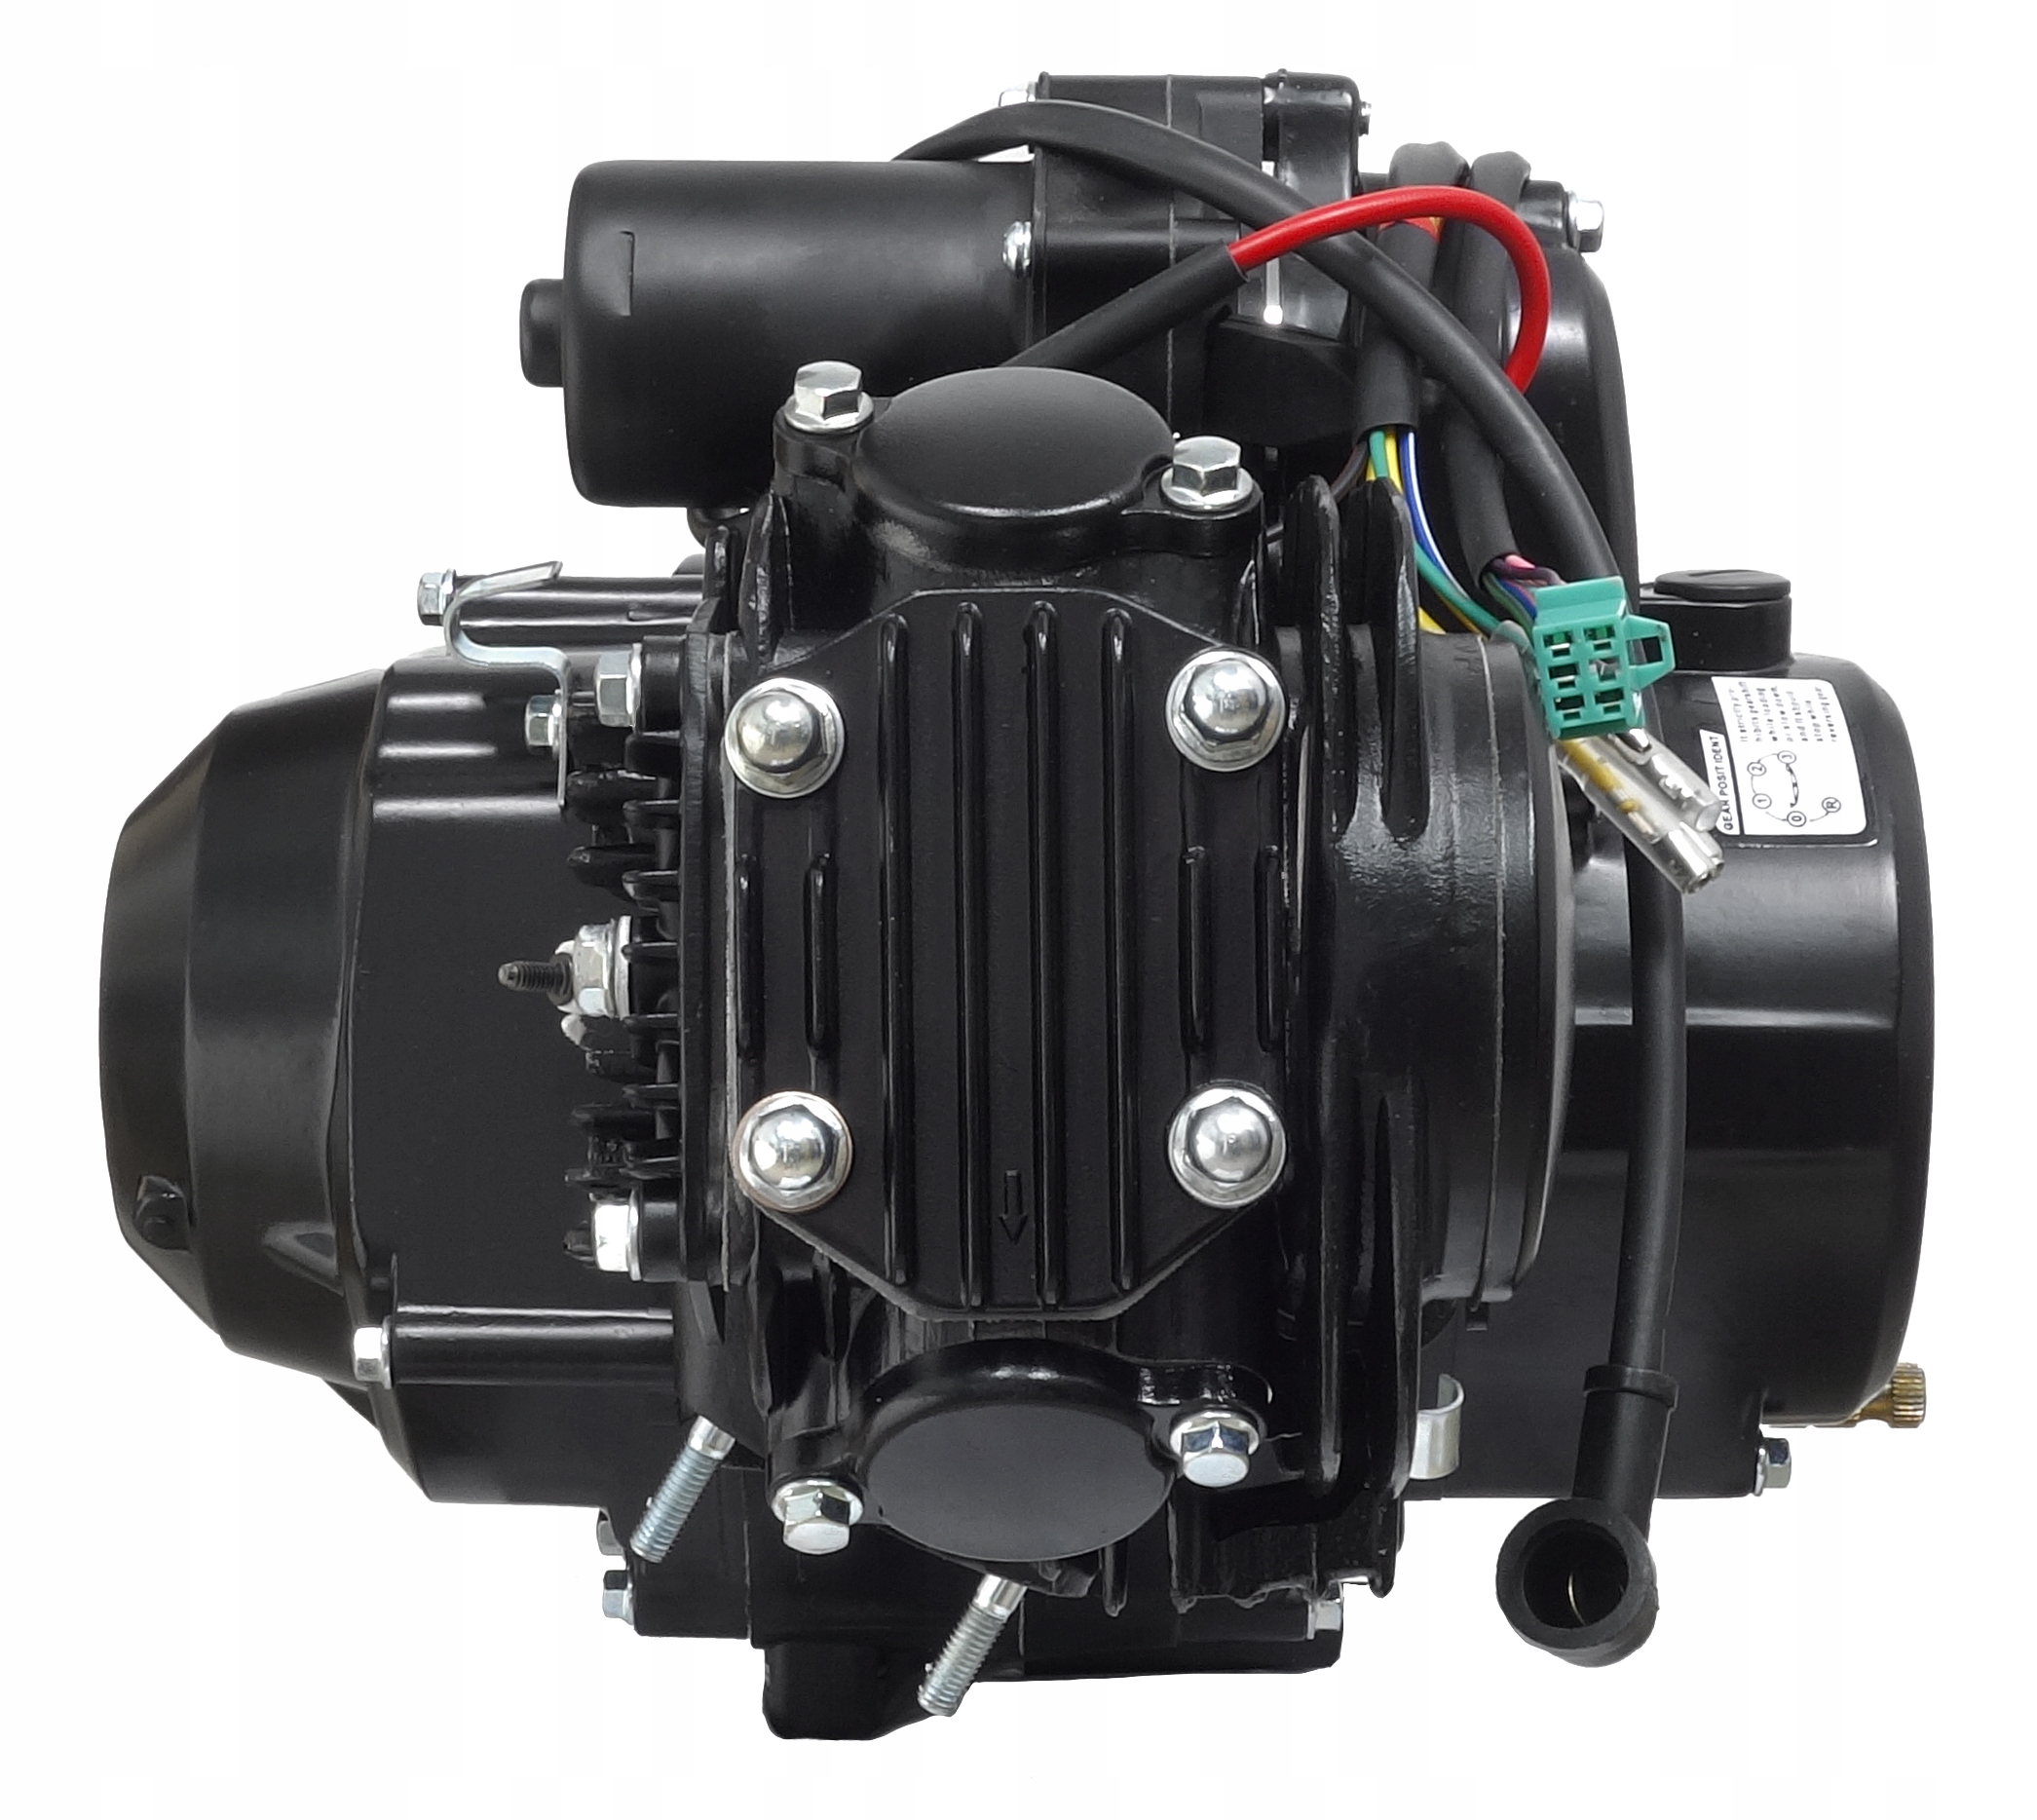 Двигатель 1+ 1 atv quad 125 kxd bombardier eagle force, фото 1